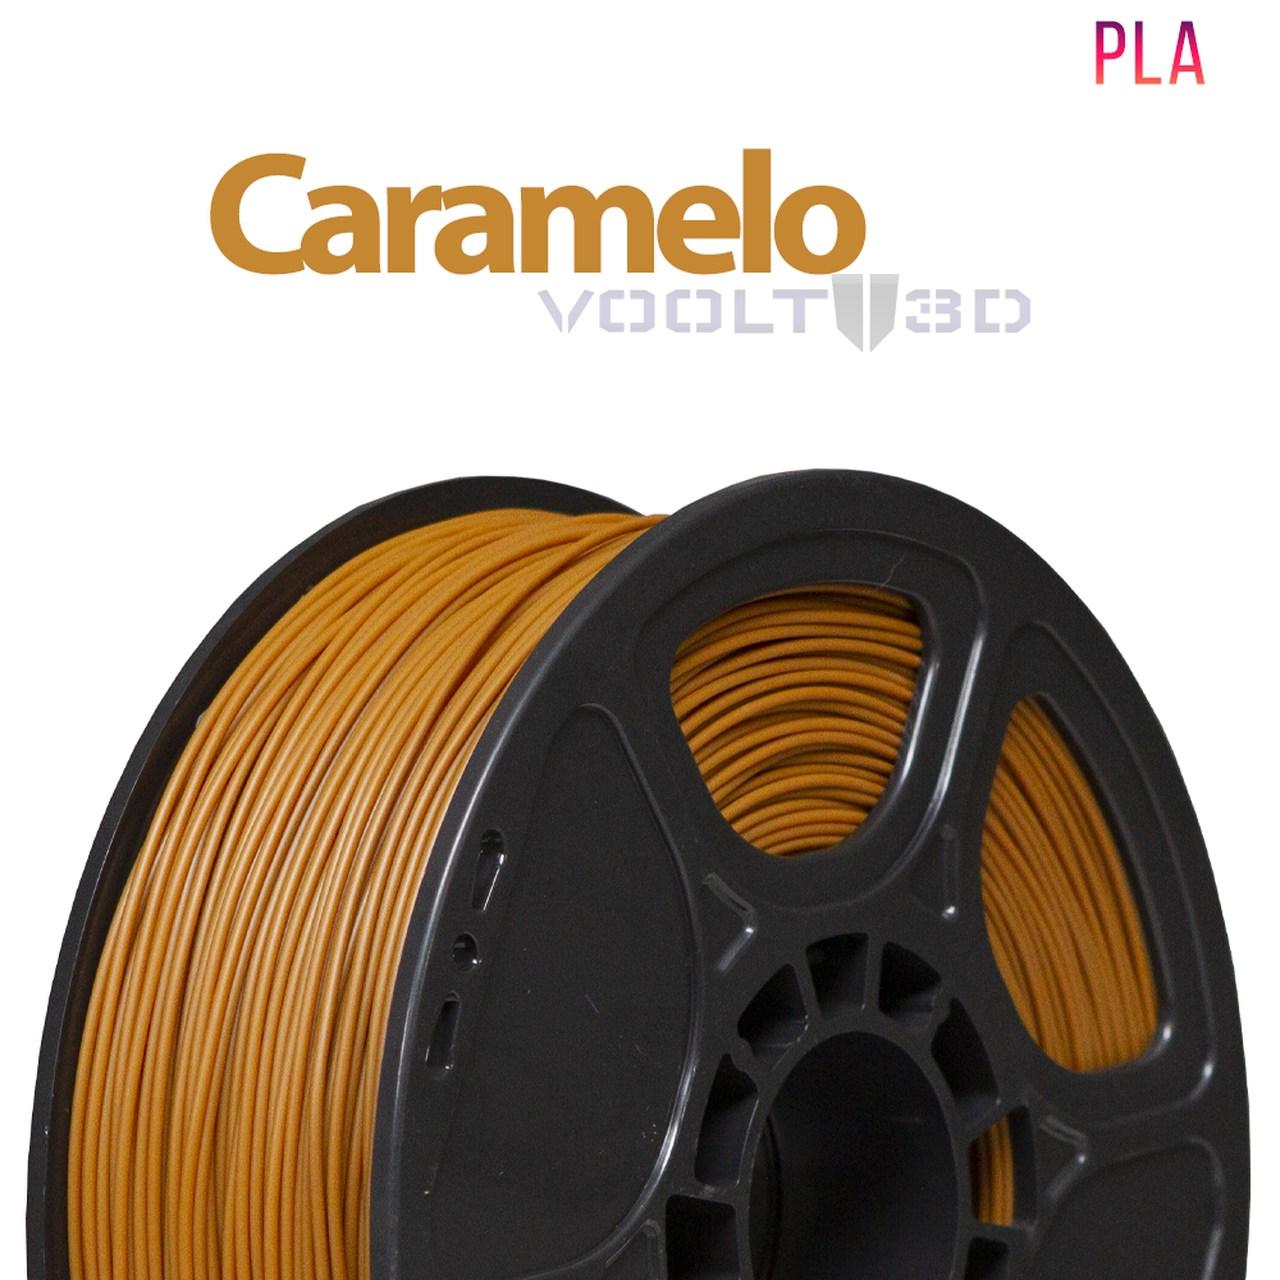 Filamento PLA - Caramelo - Voolt - 1.75mm - 1kg